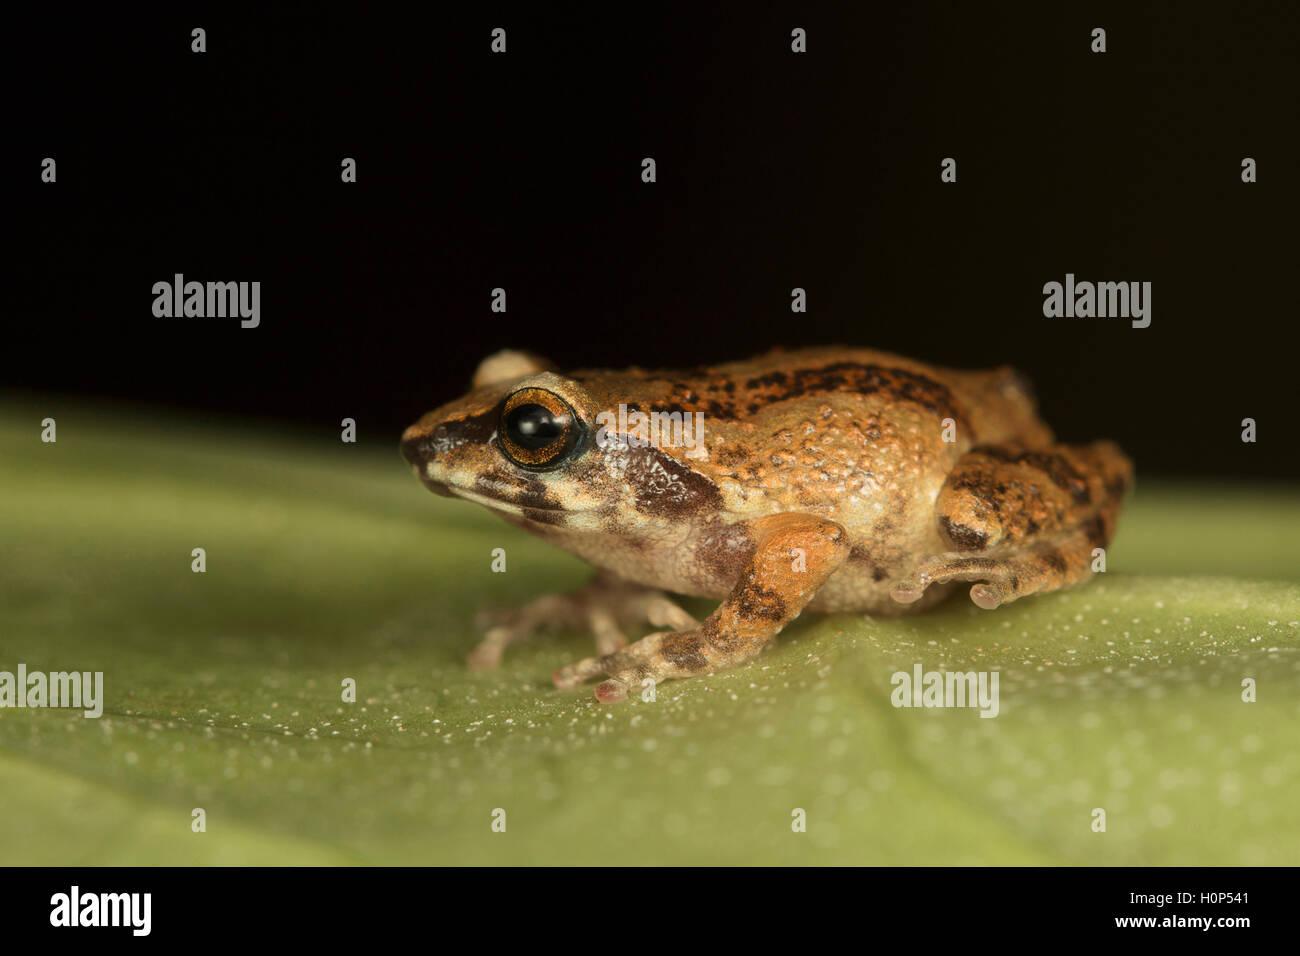 Small bush frog, Raorchestes dubois Kodaikanal, Tamil Nadu. Breeds during monsoons and froglets hatch from eggs. - Stock Image